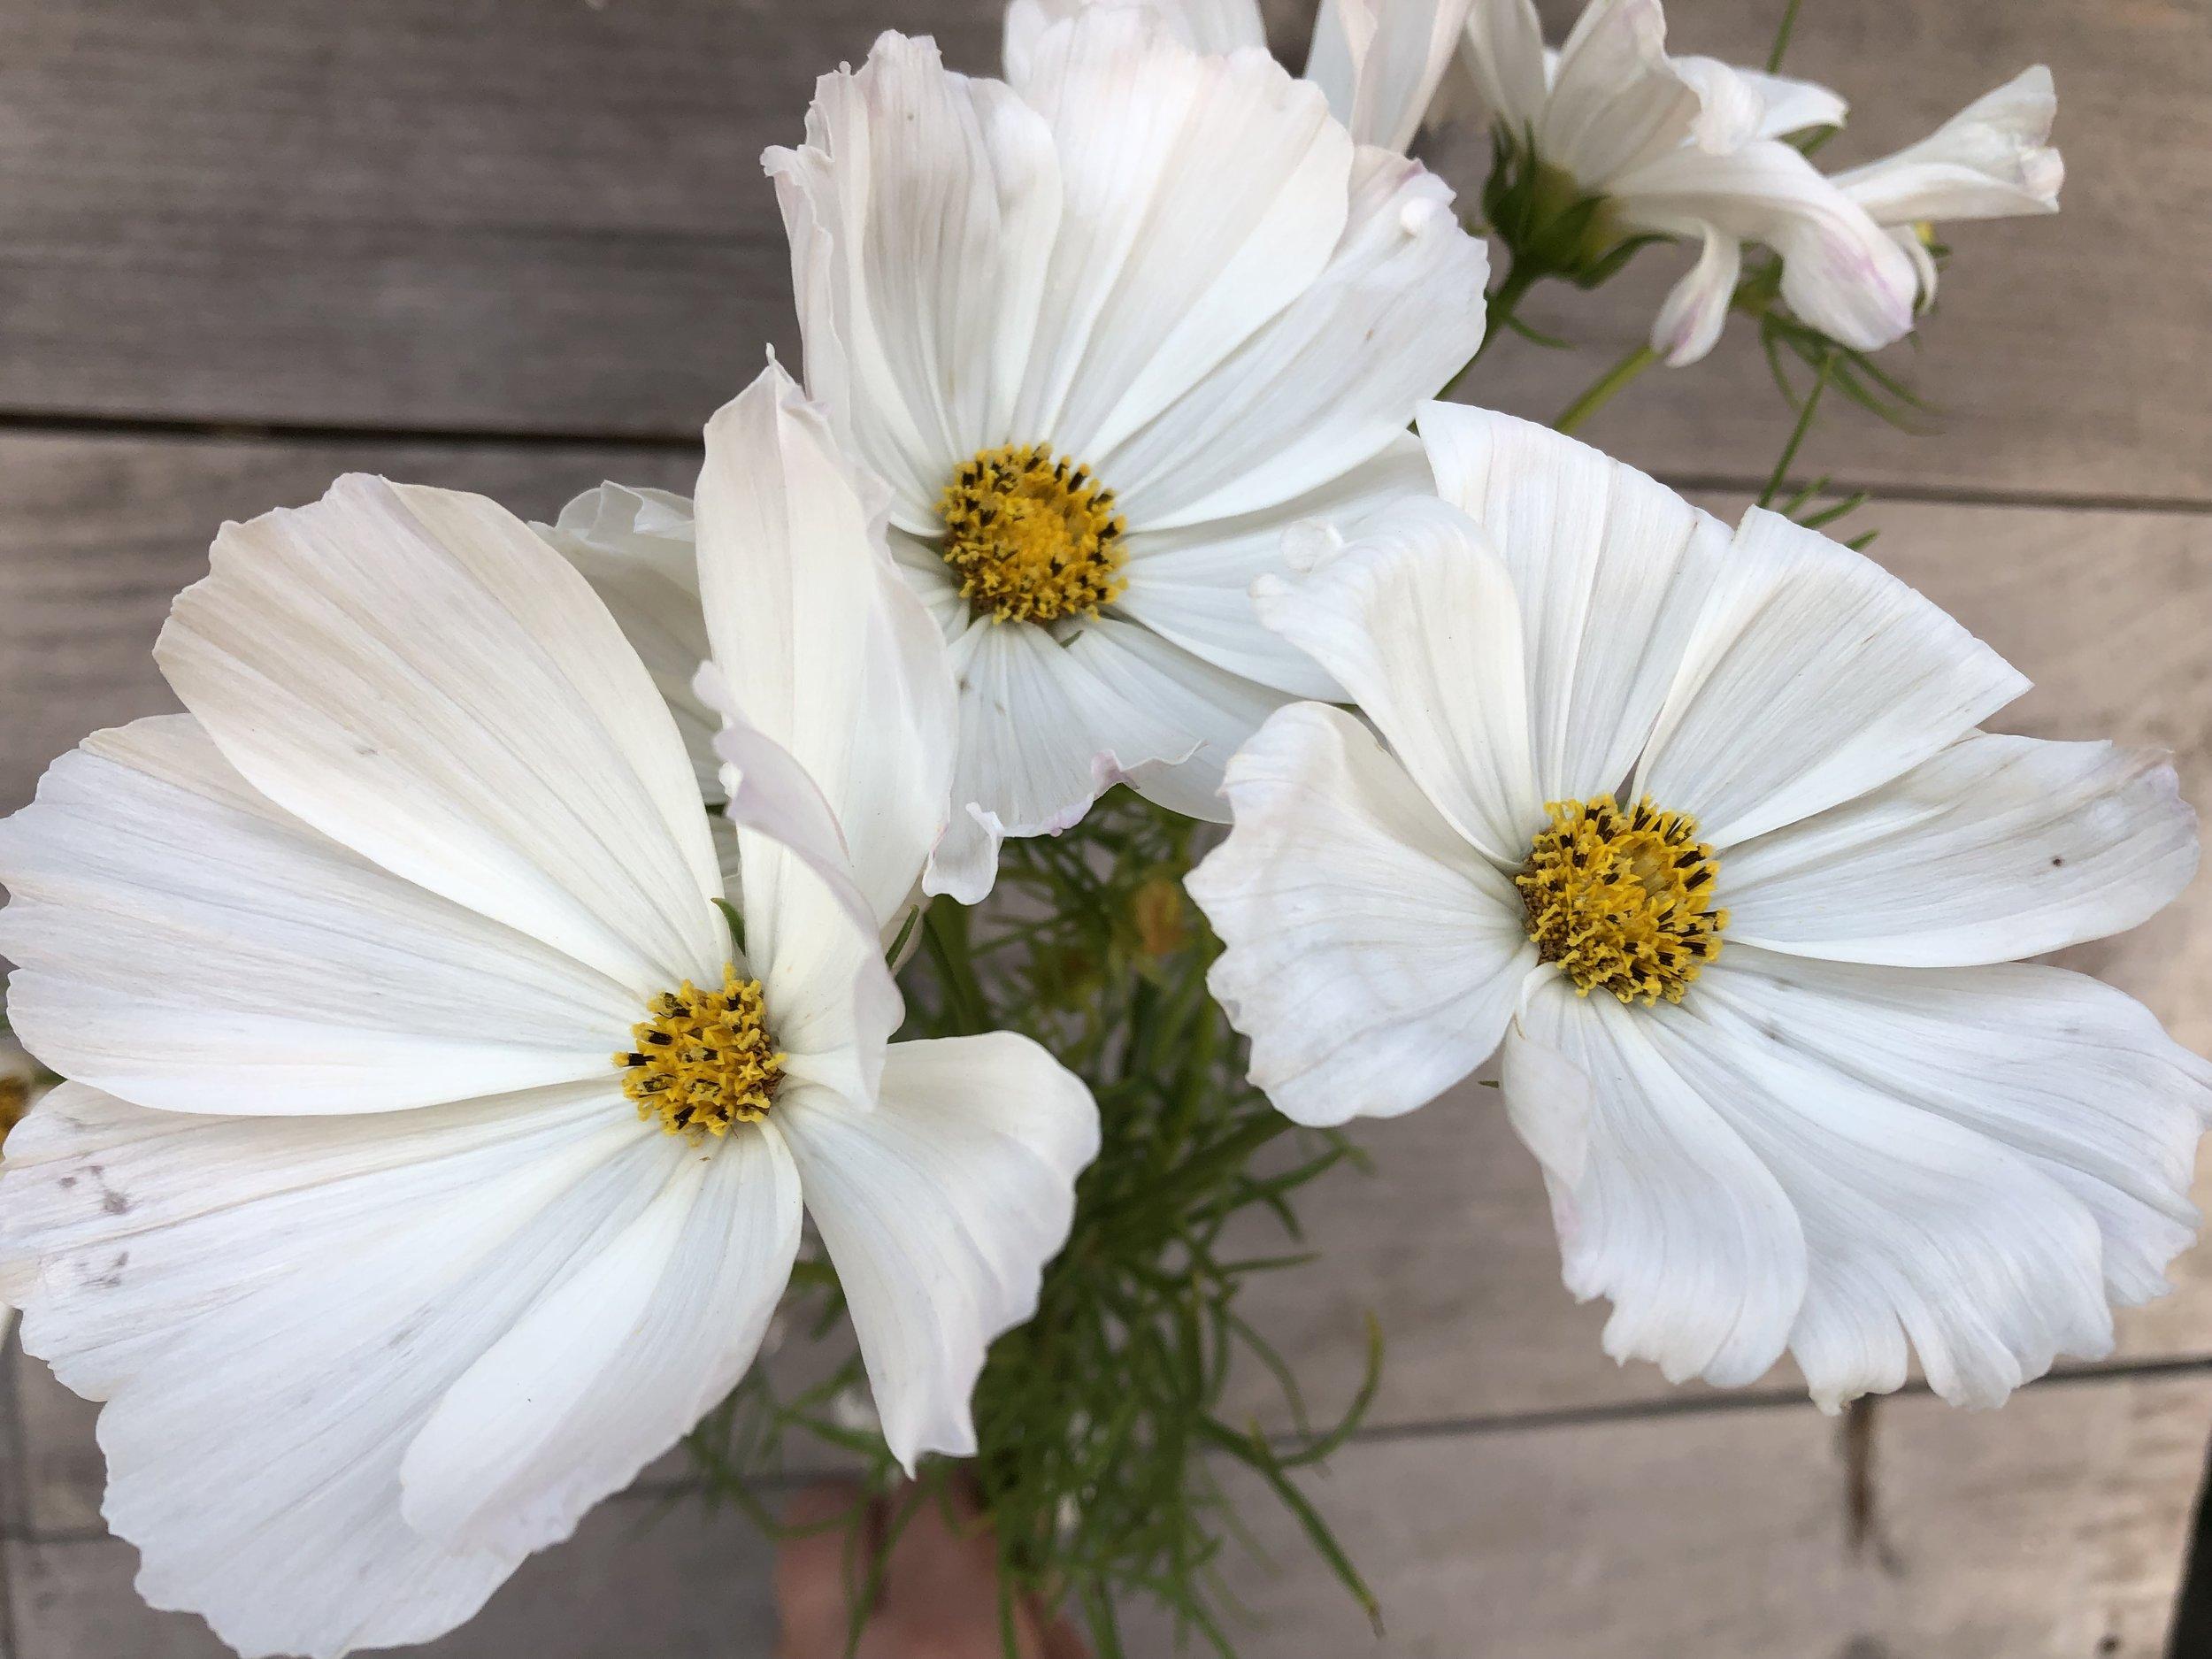 Cosmos, Versailles White